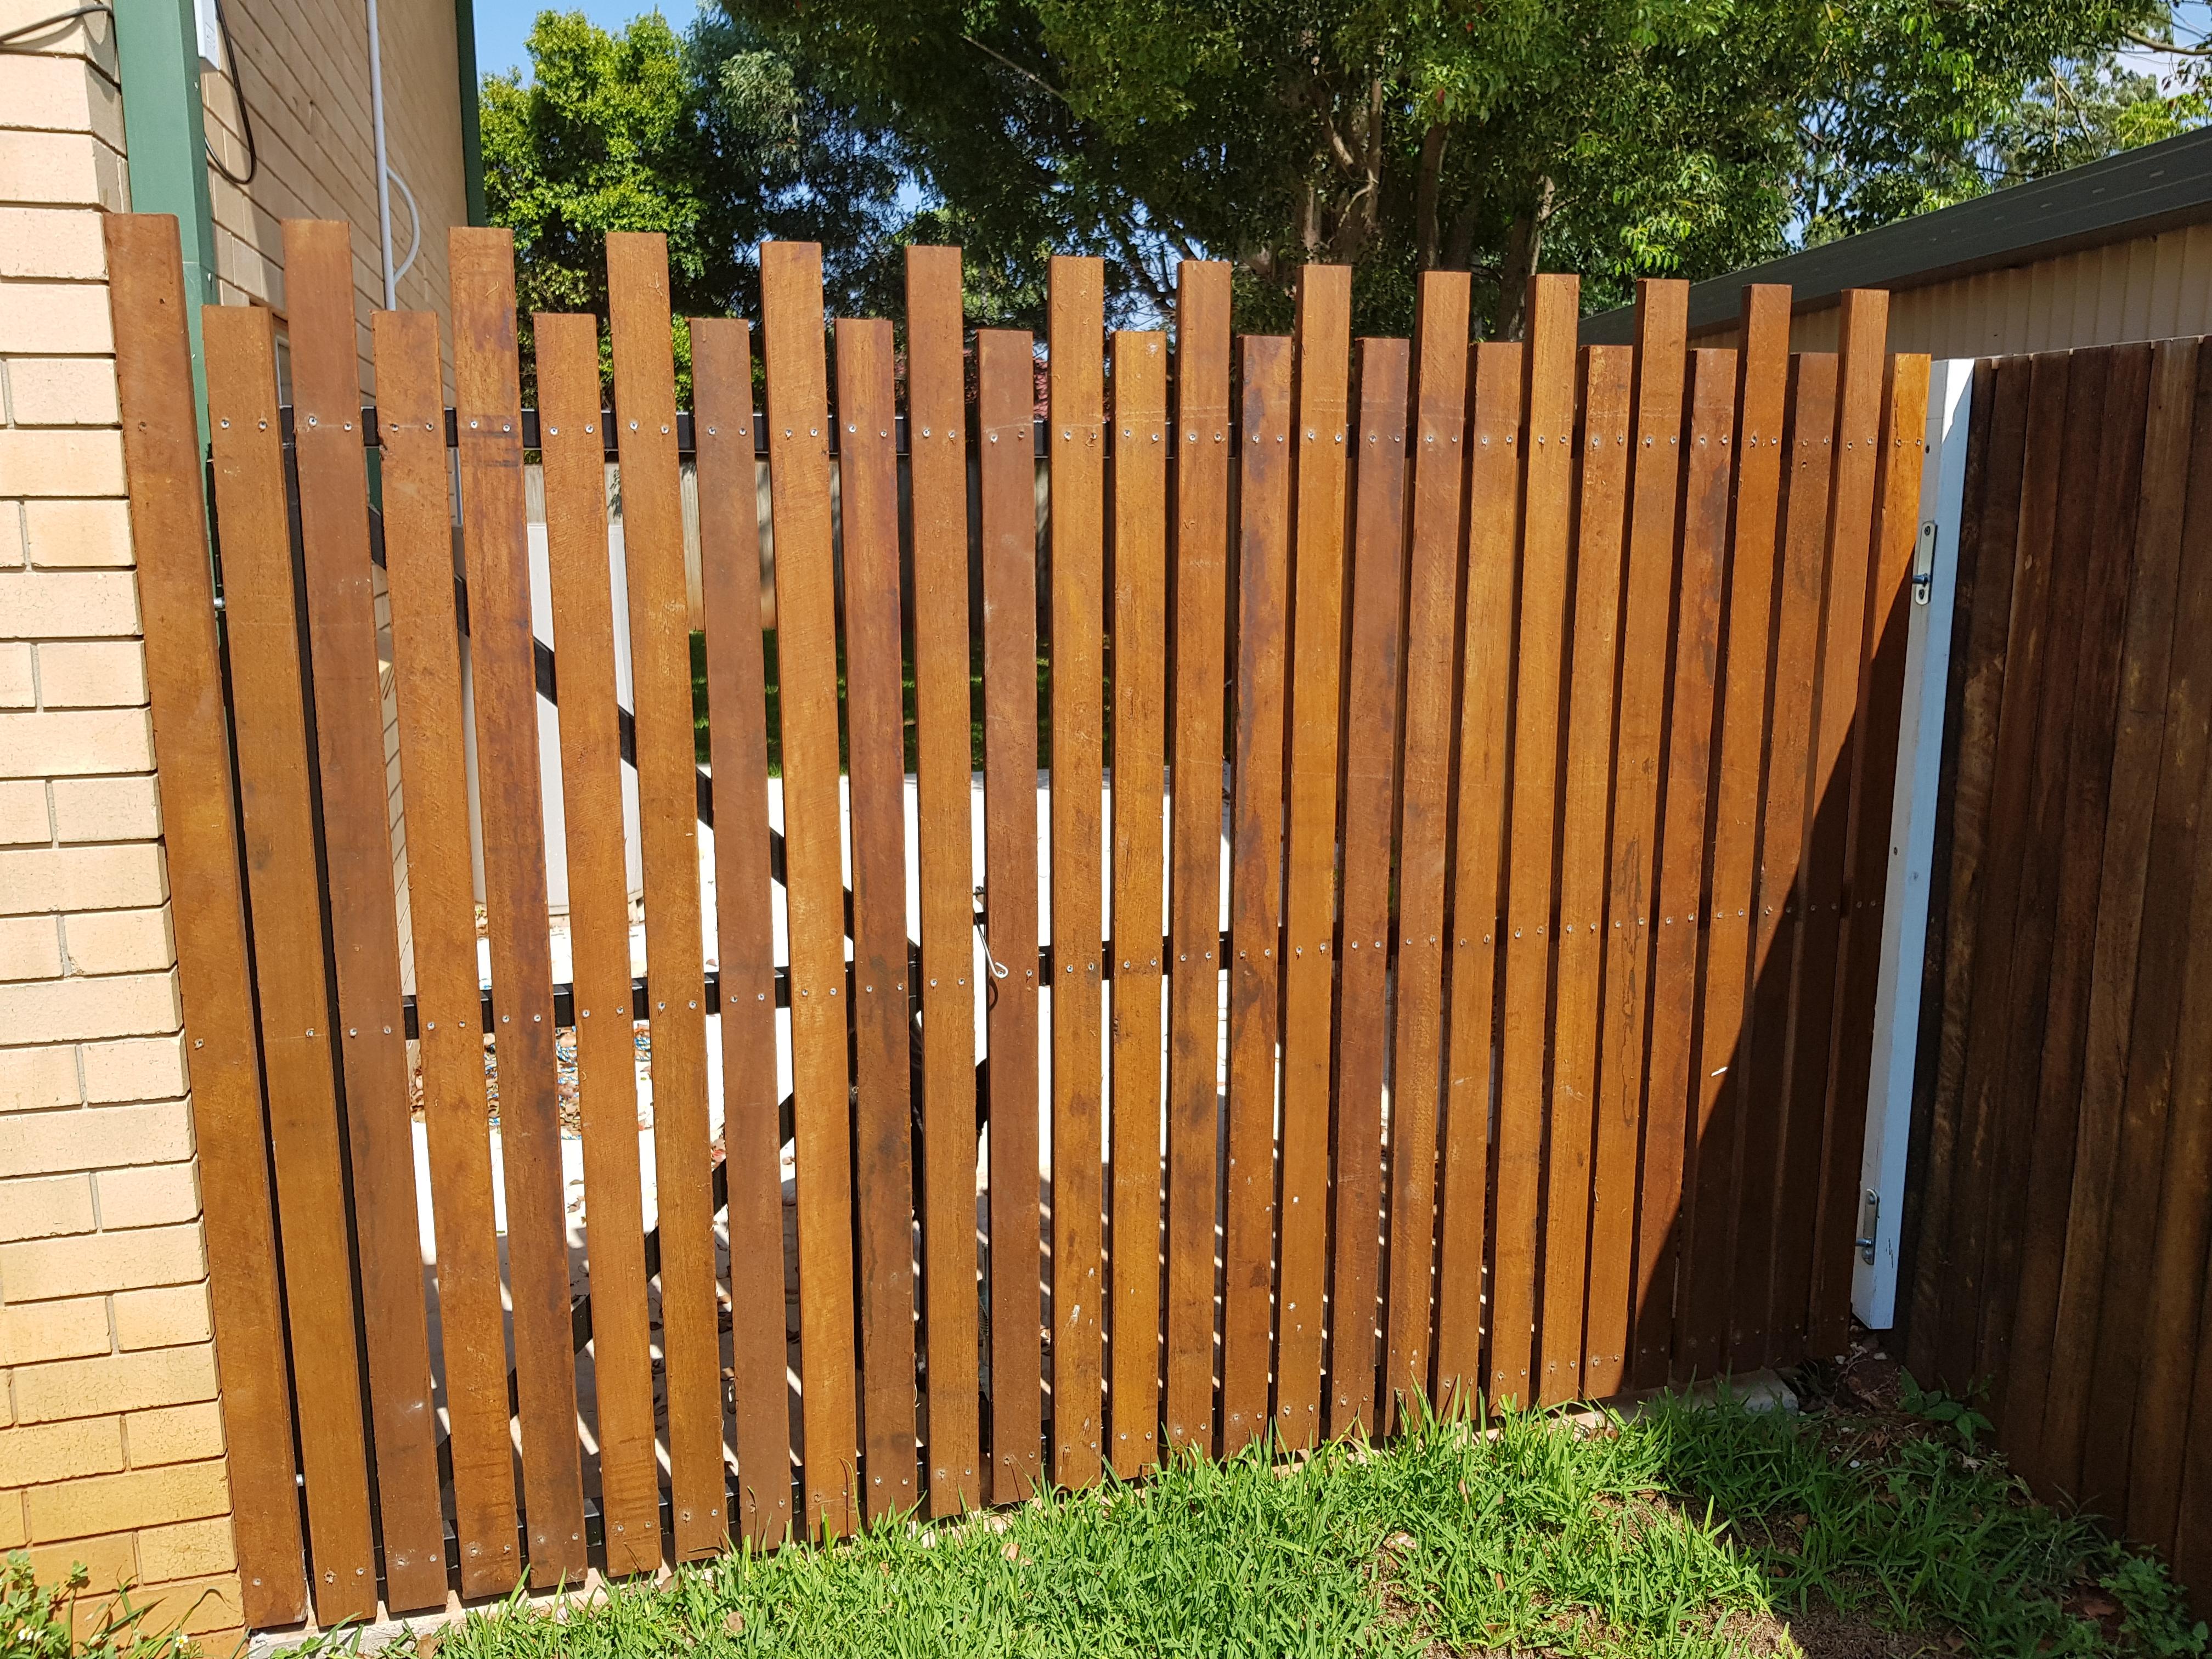 Hardwood side fence